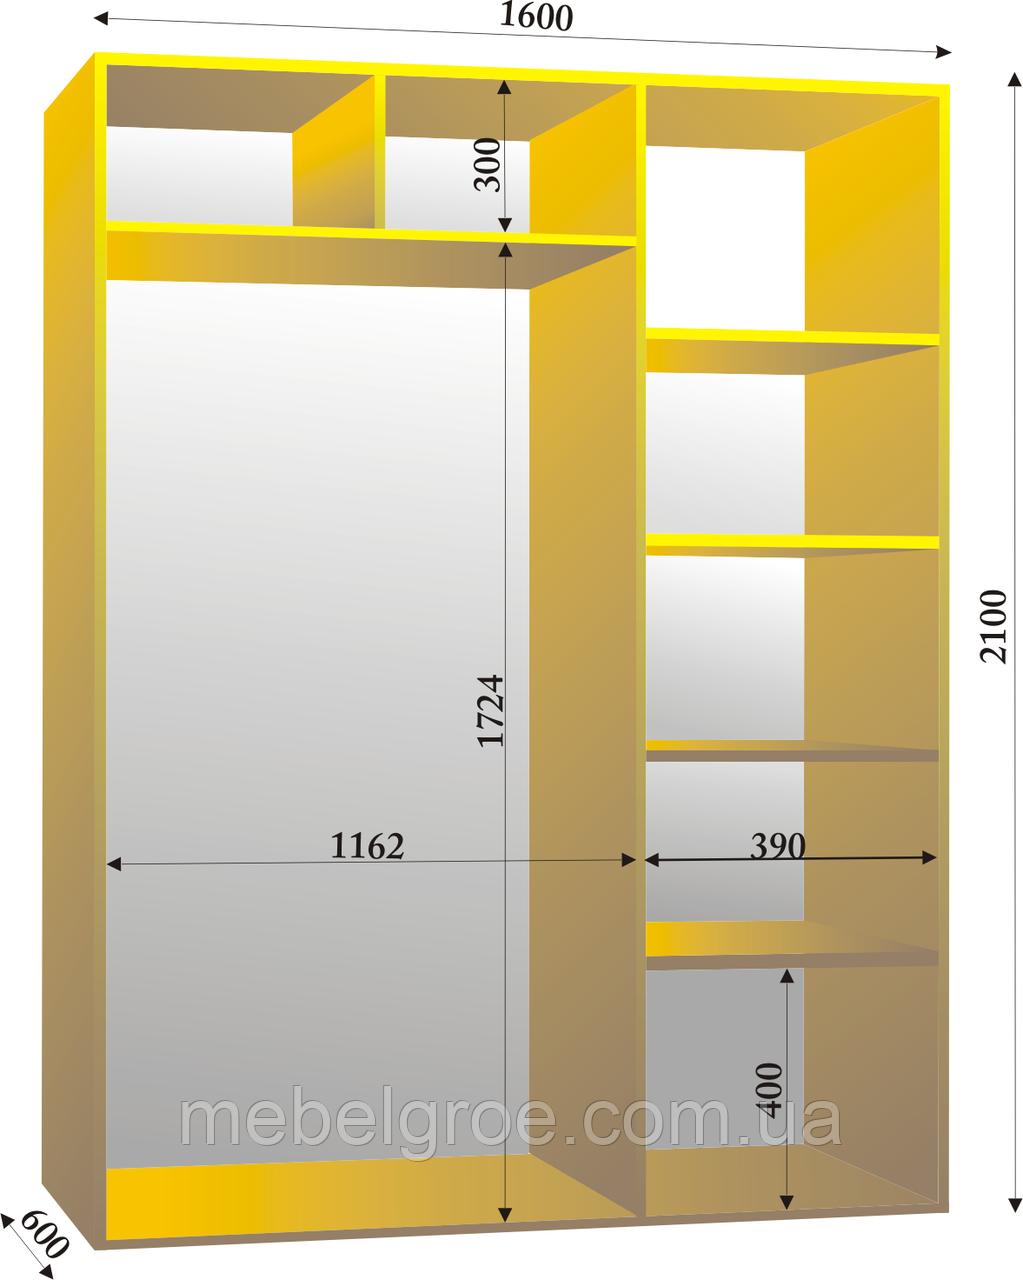 Шкаф-купе двухдверный 1600х600х2100 тм Эксклюзив